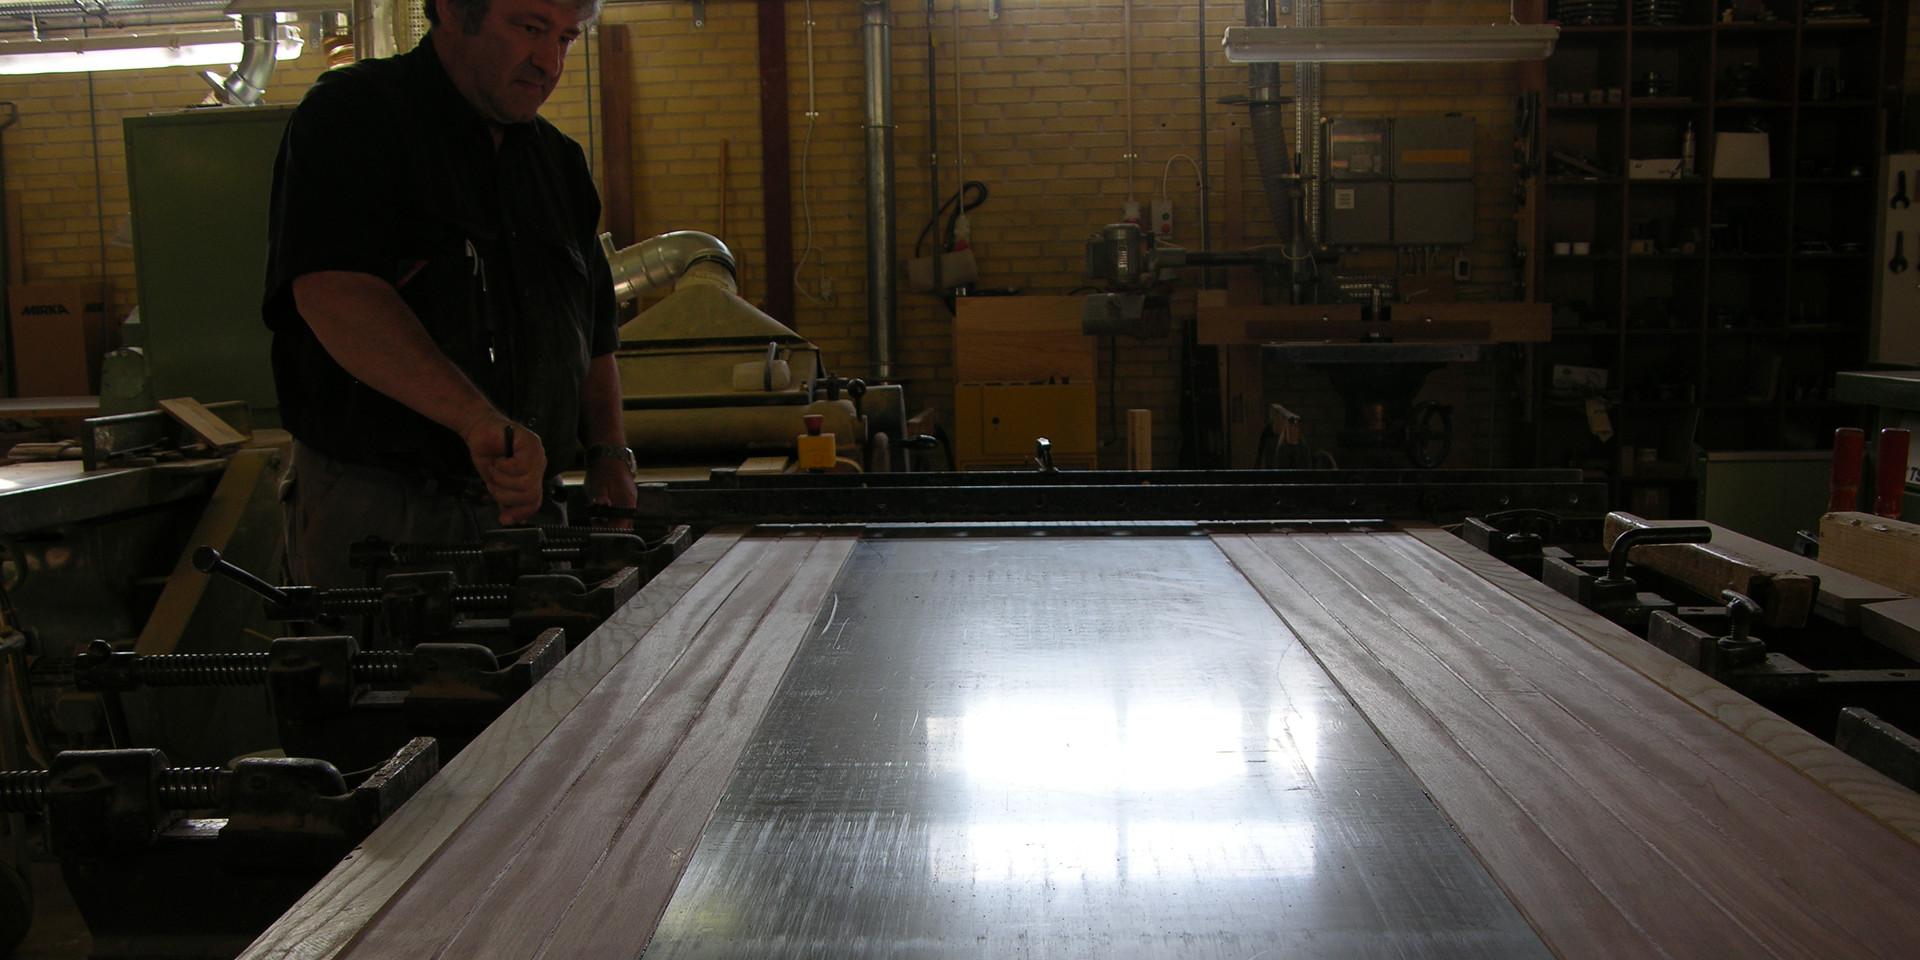 Putting together hardwood and acrylic